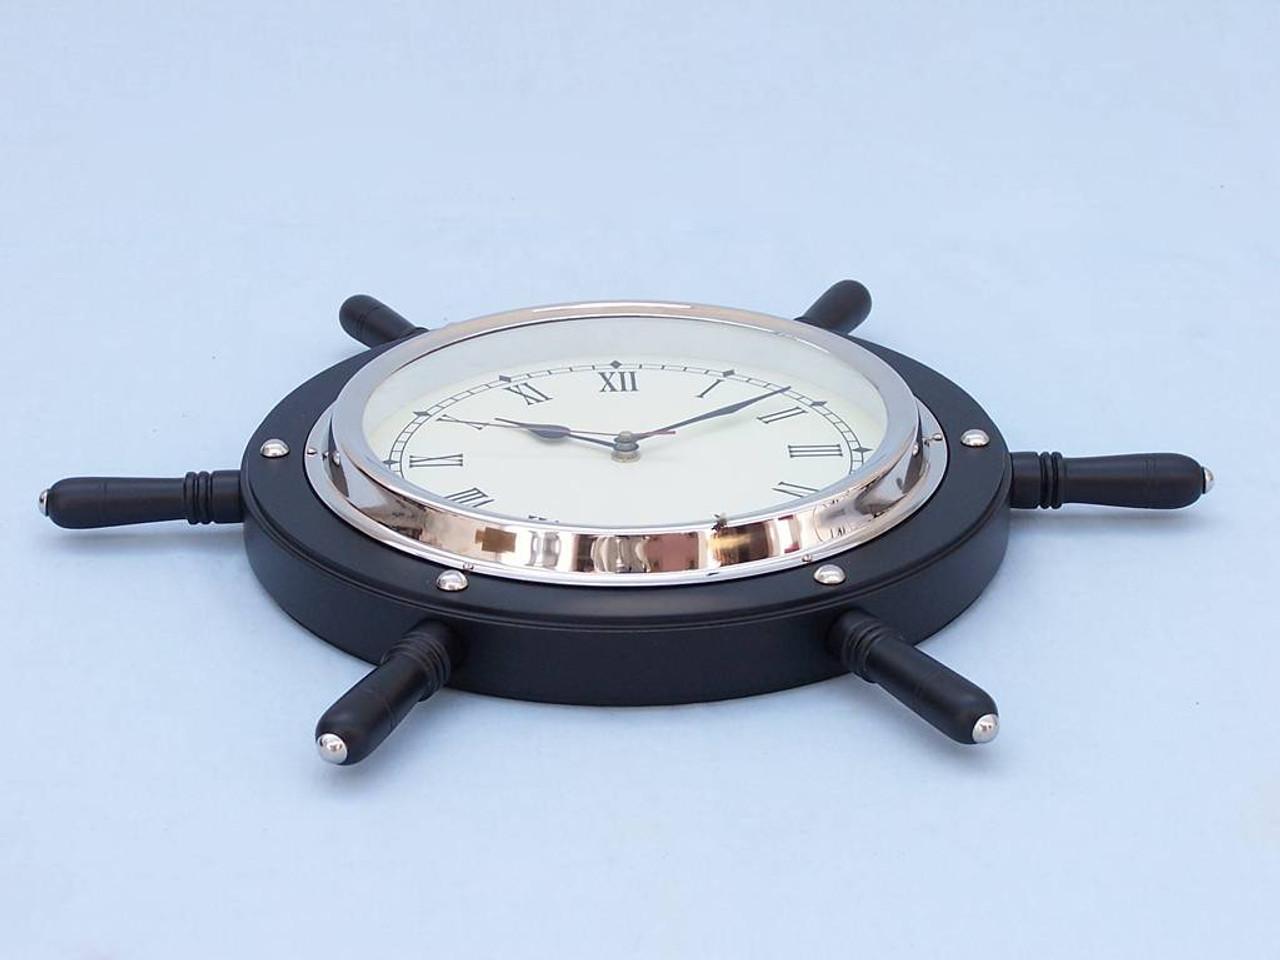 Pirate Ships Wooden Steering Wheel Black Chrome Clock